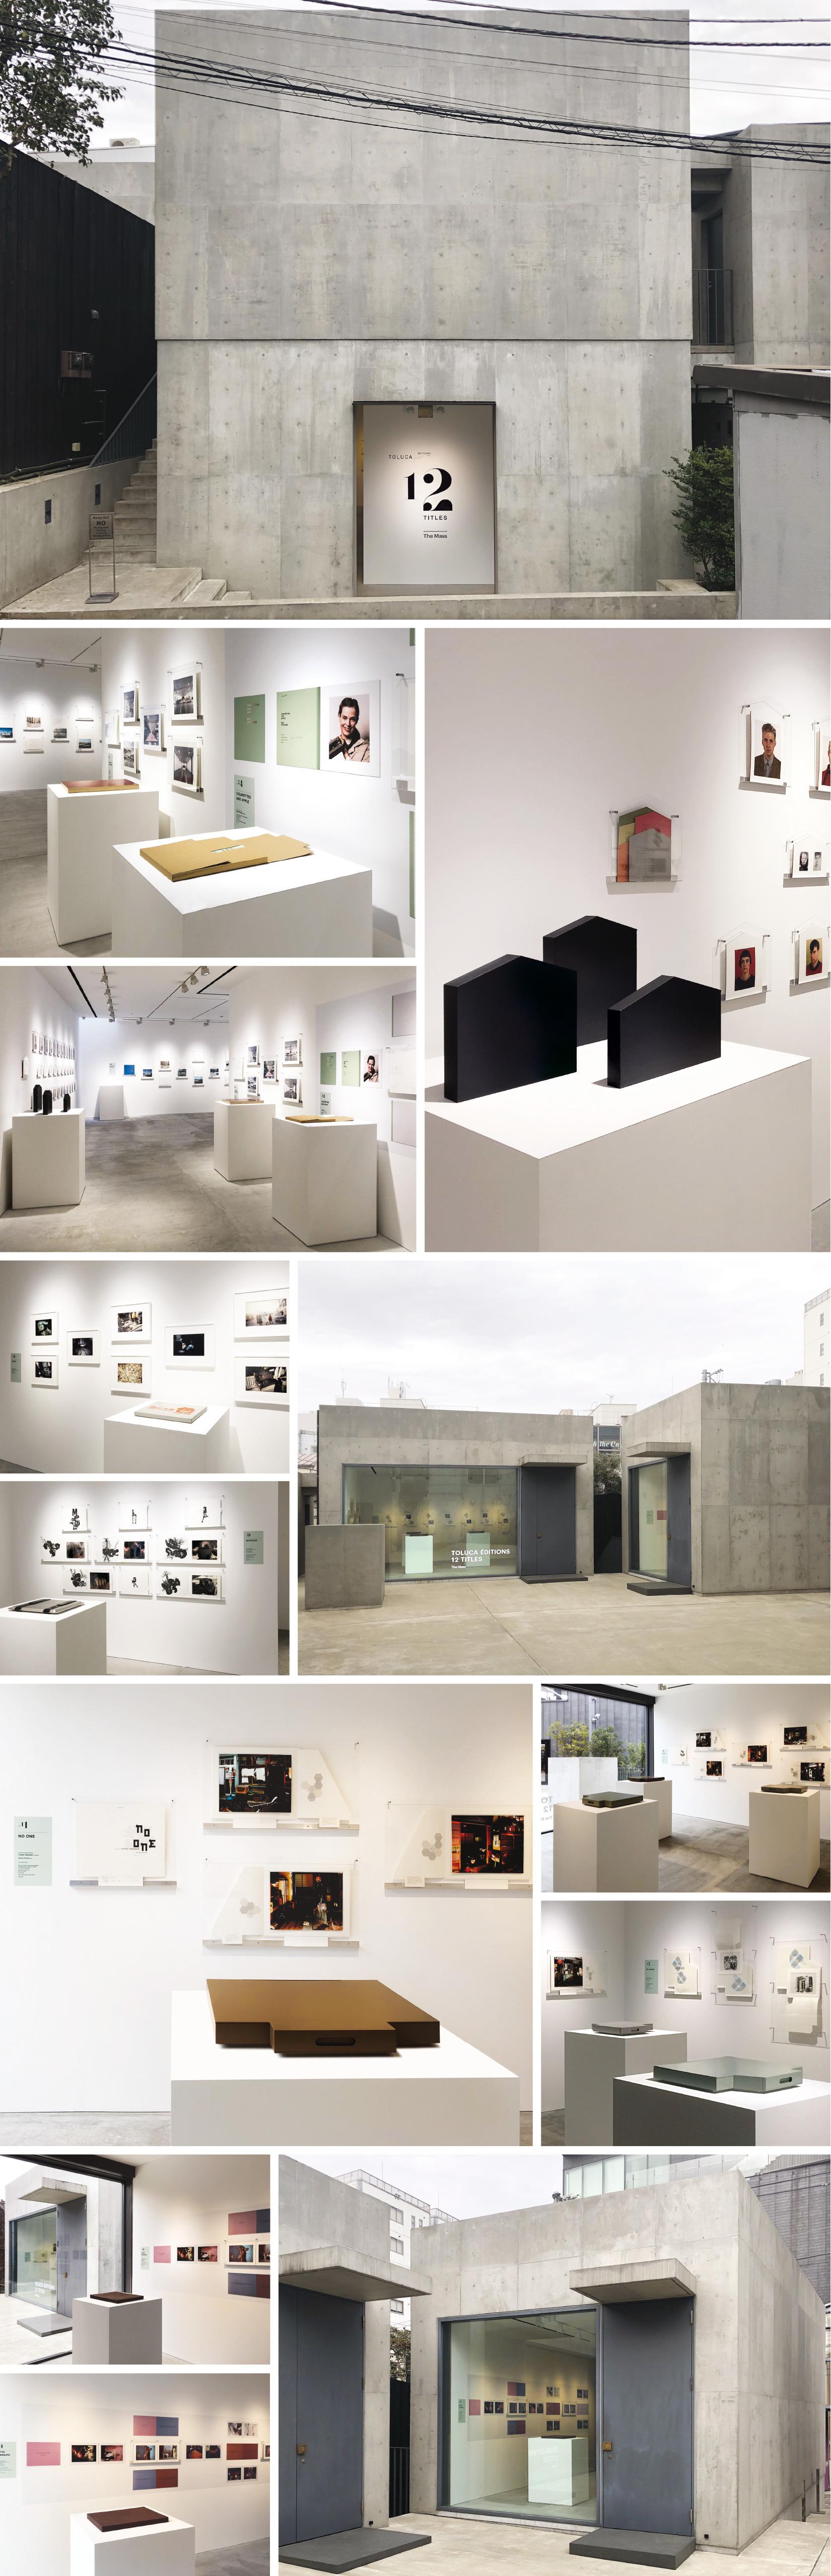 THE-MASS-TOKYO-TOLUCA-STUDIO-OLIVIER-ANDREOTTI-1.jpg